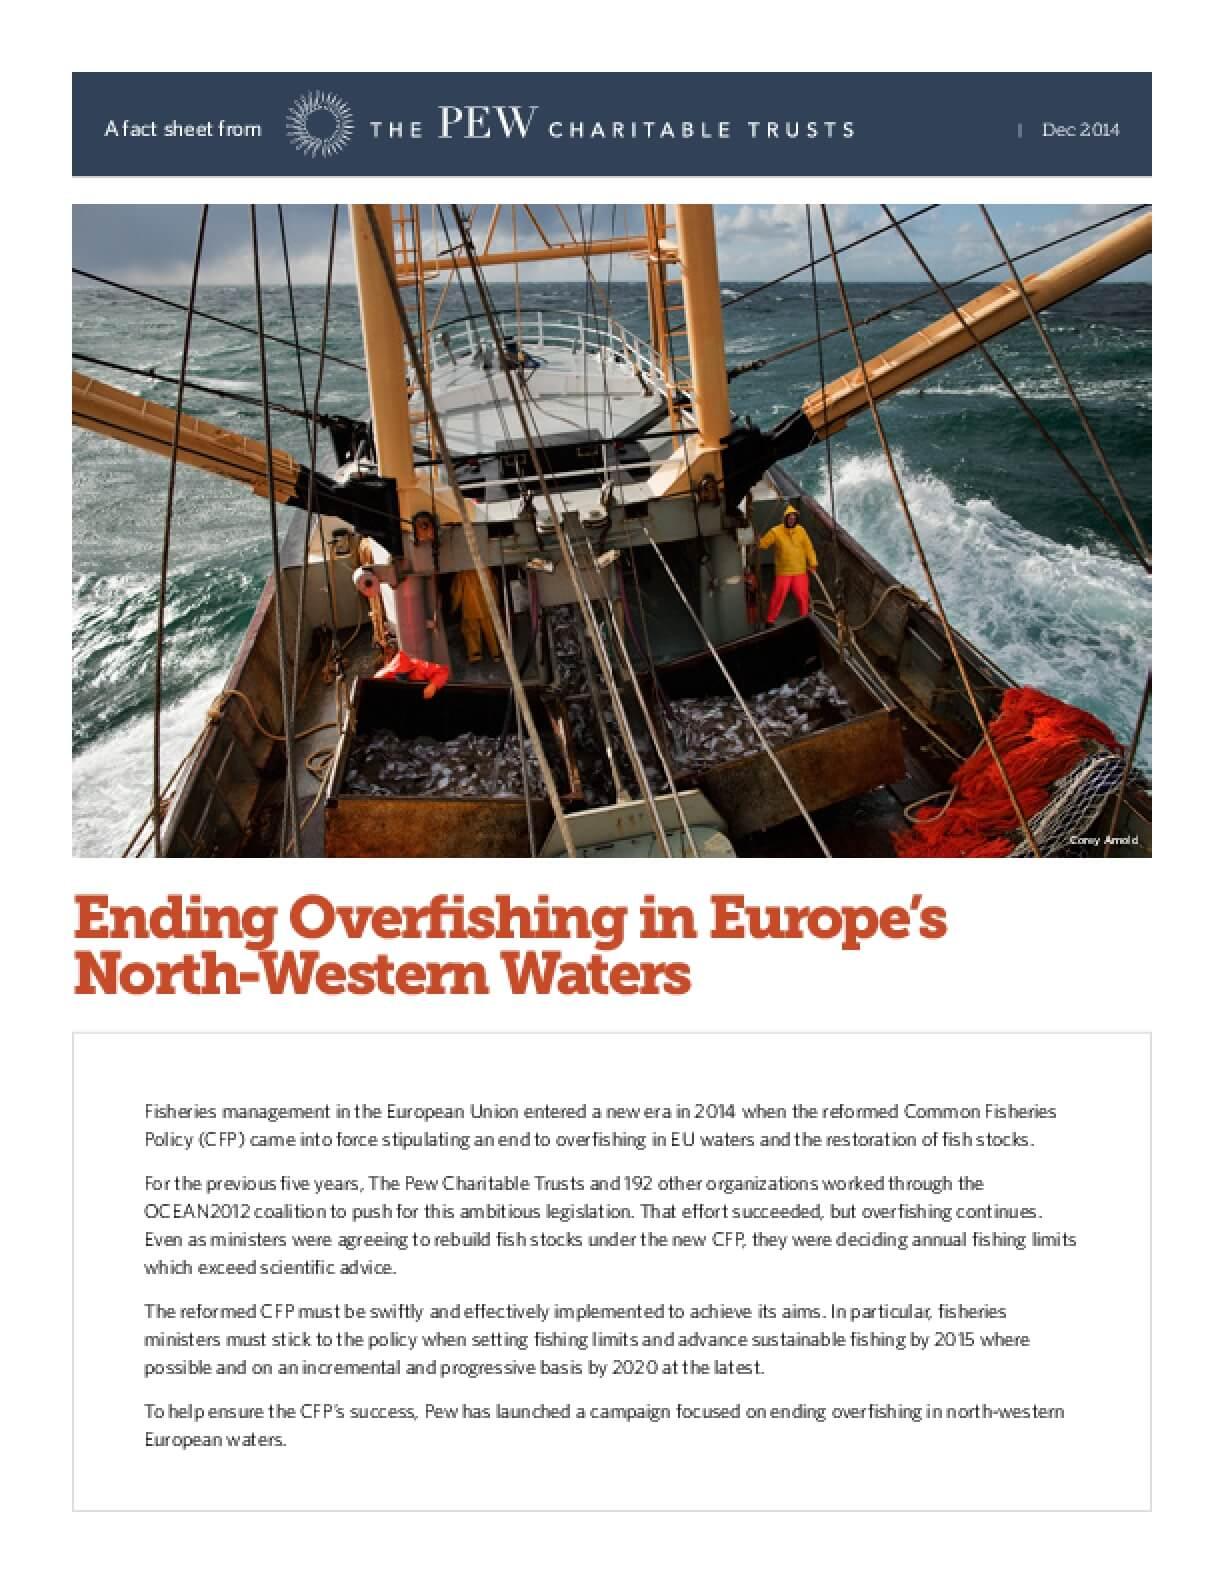 Ending Overfishing in Europe's North-Western Waters